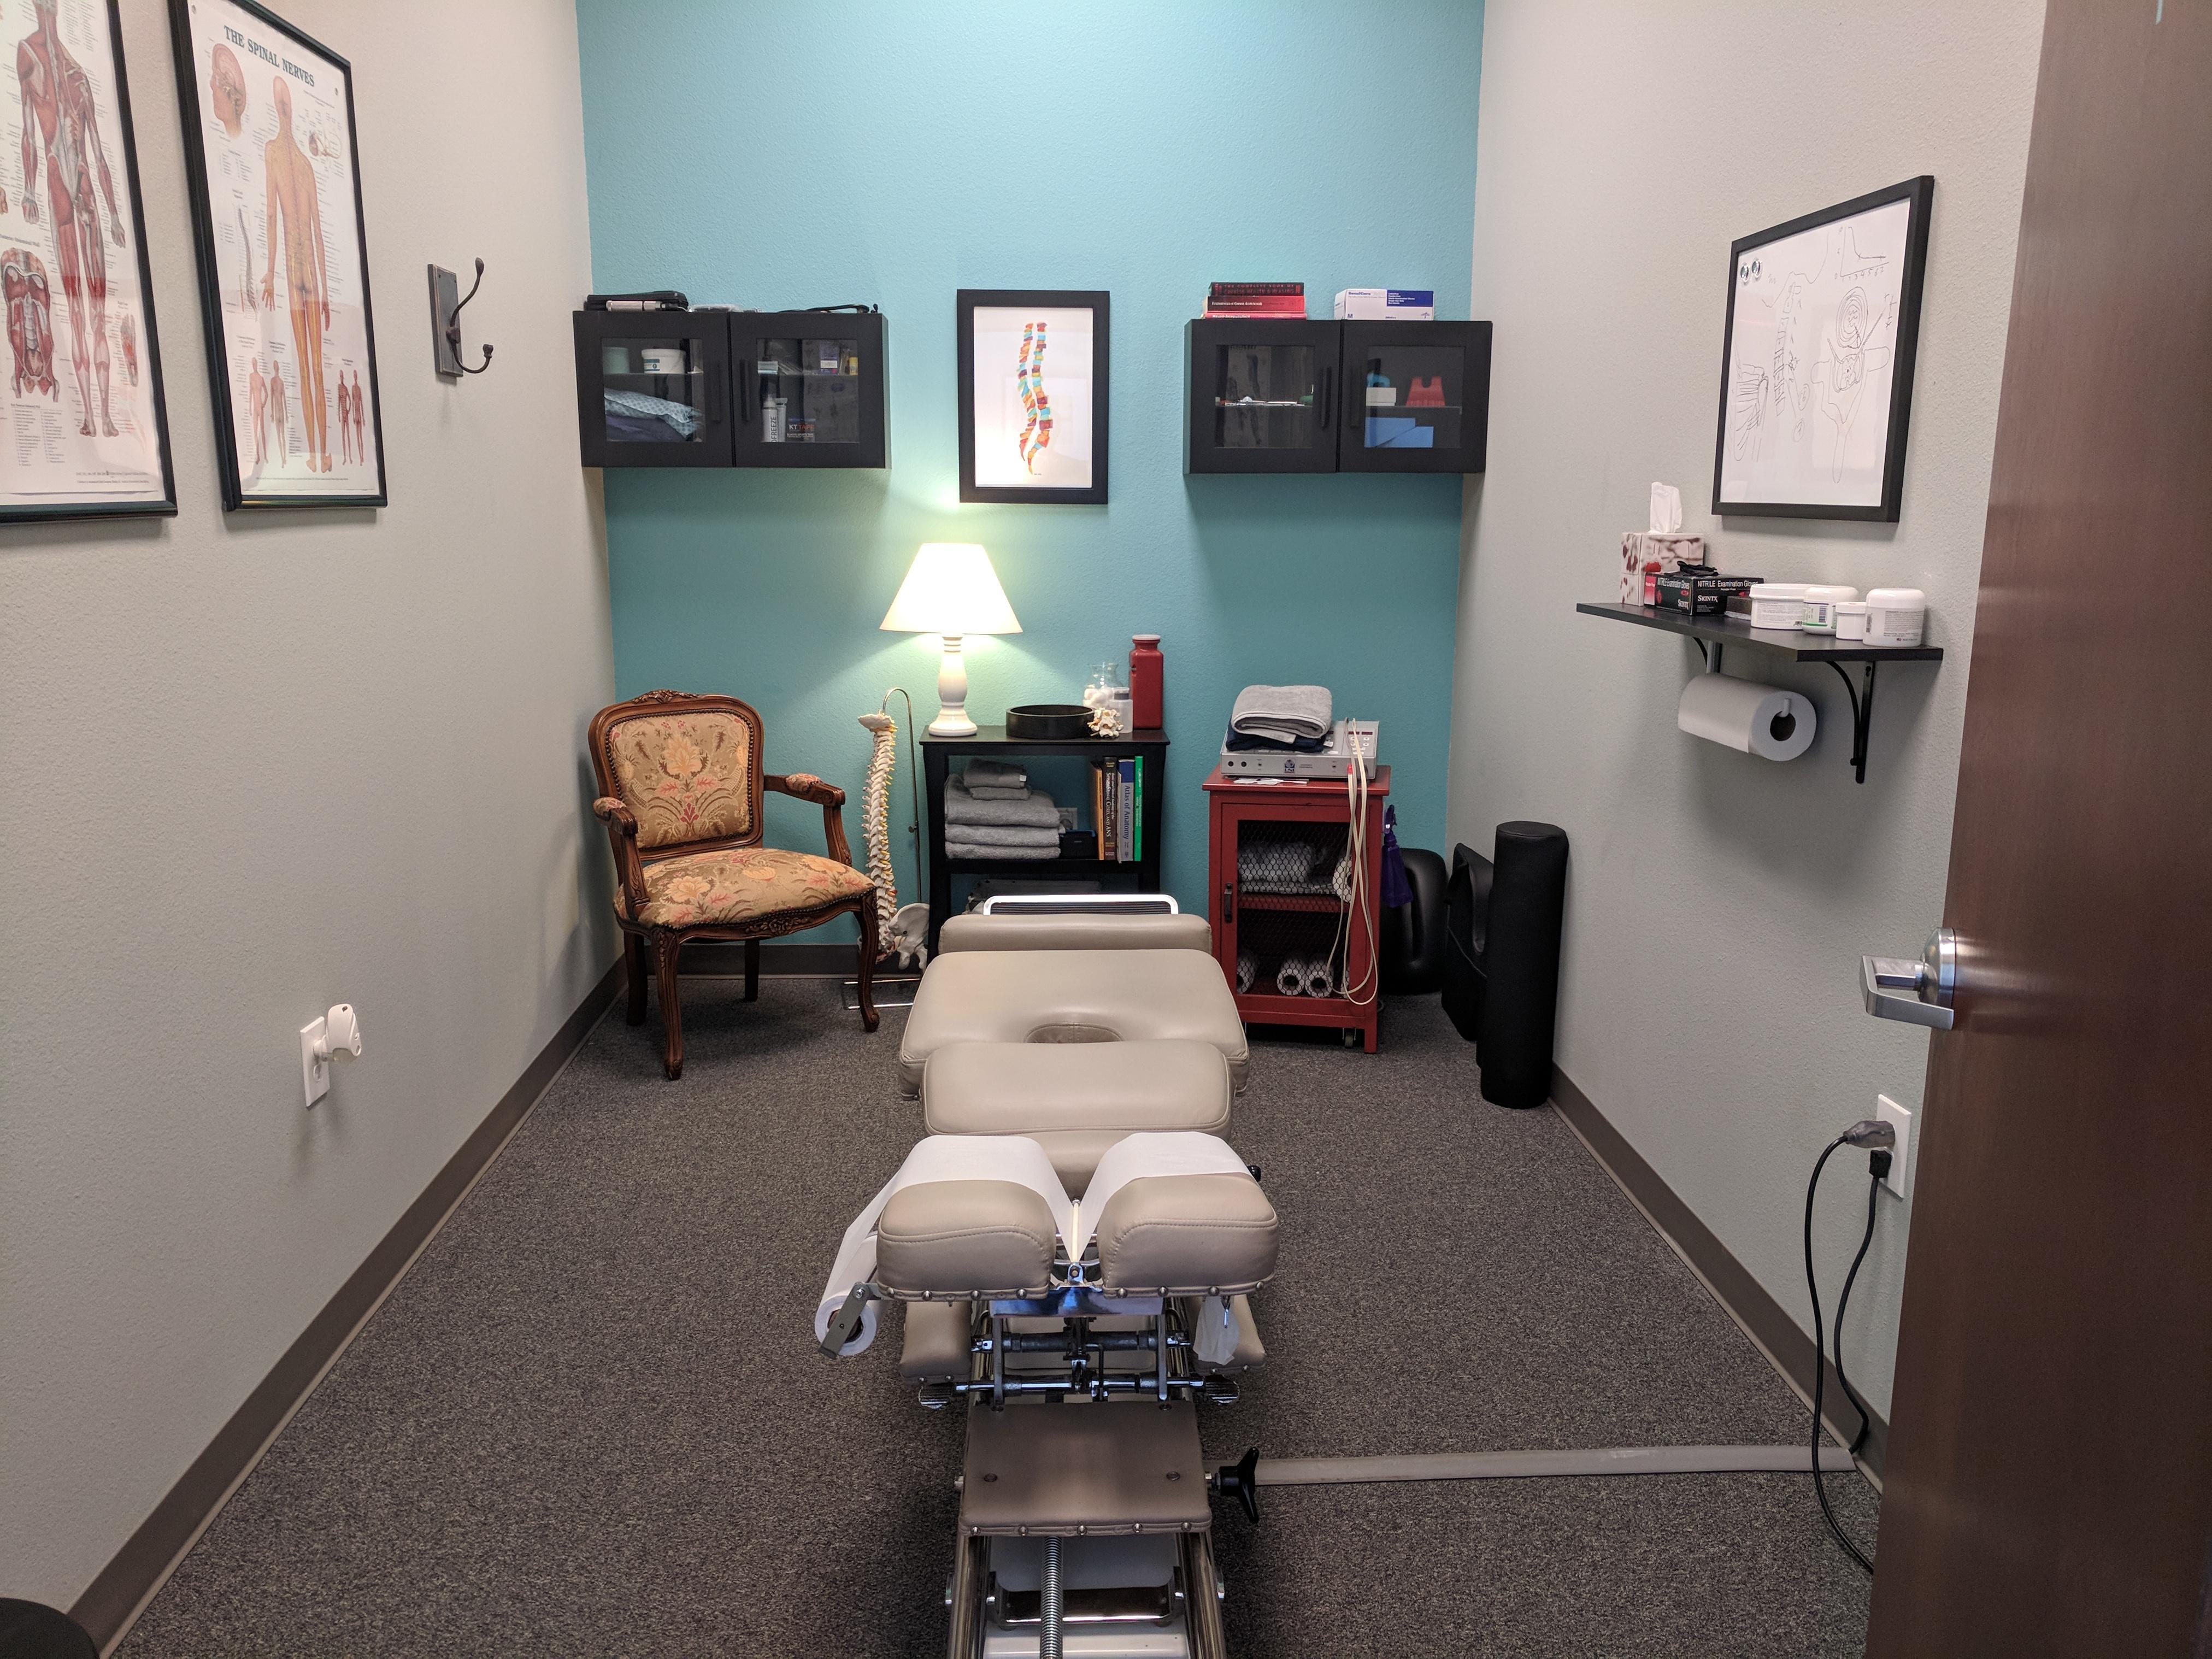 Adjusting Room at Normal Chiropractic